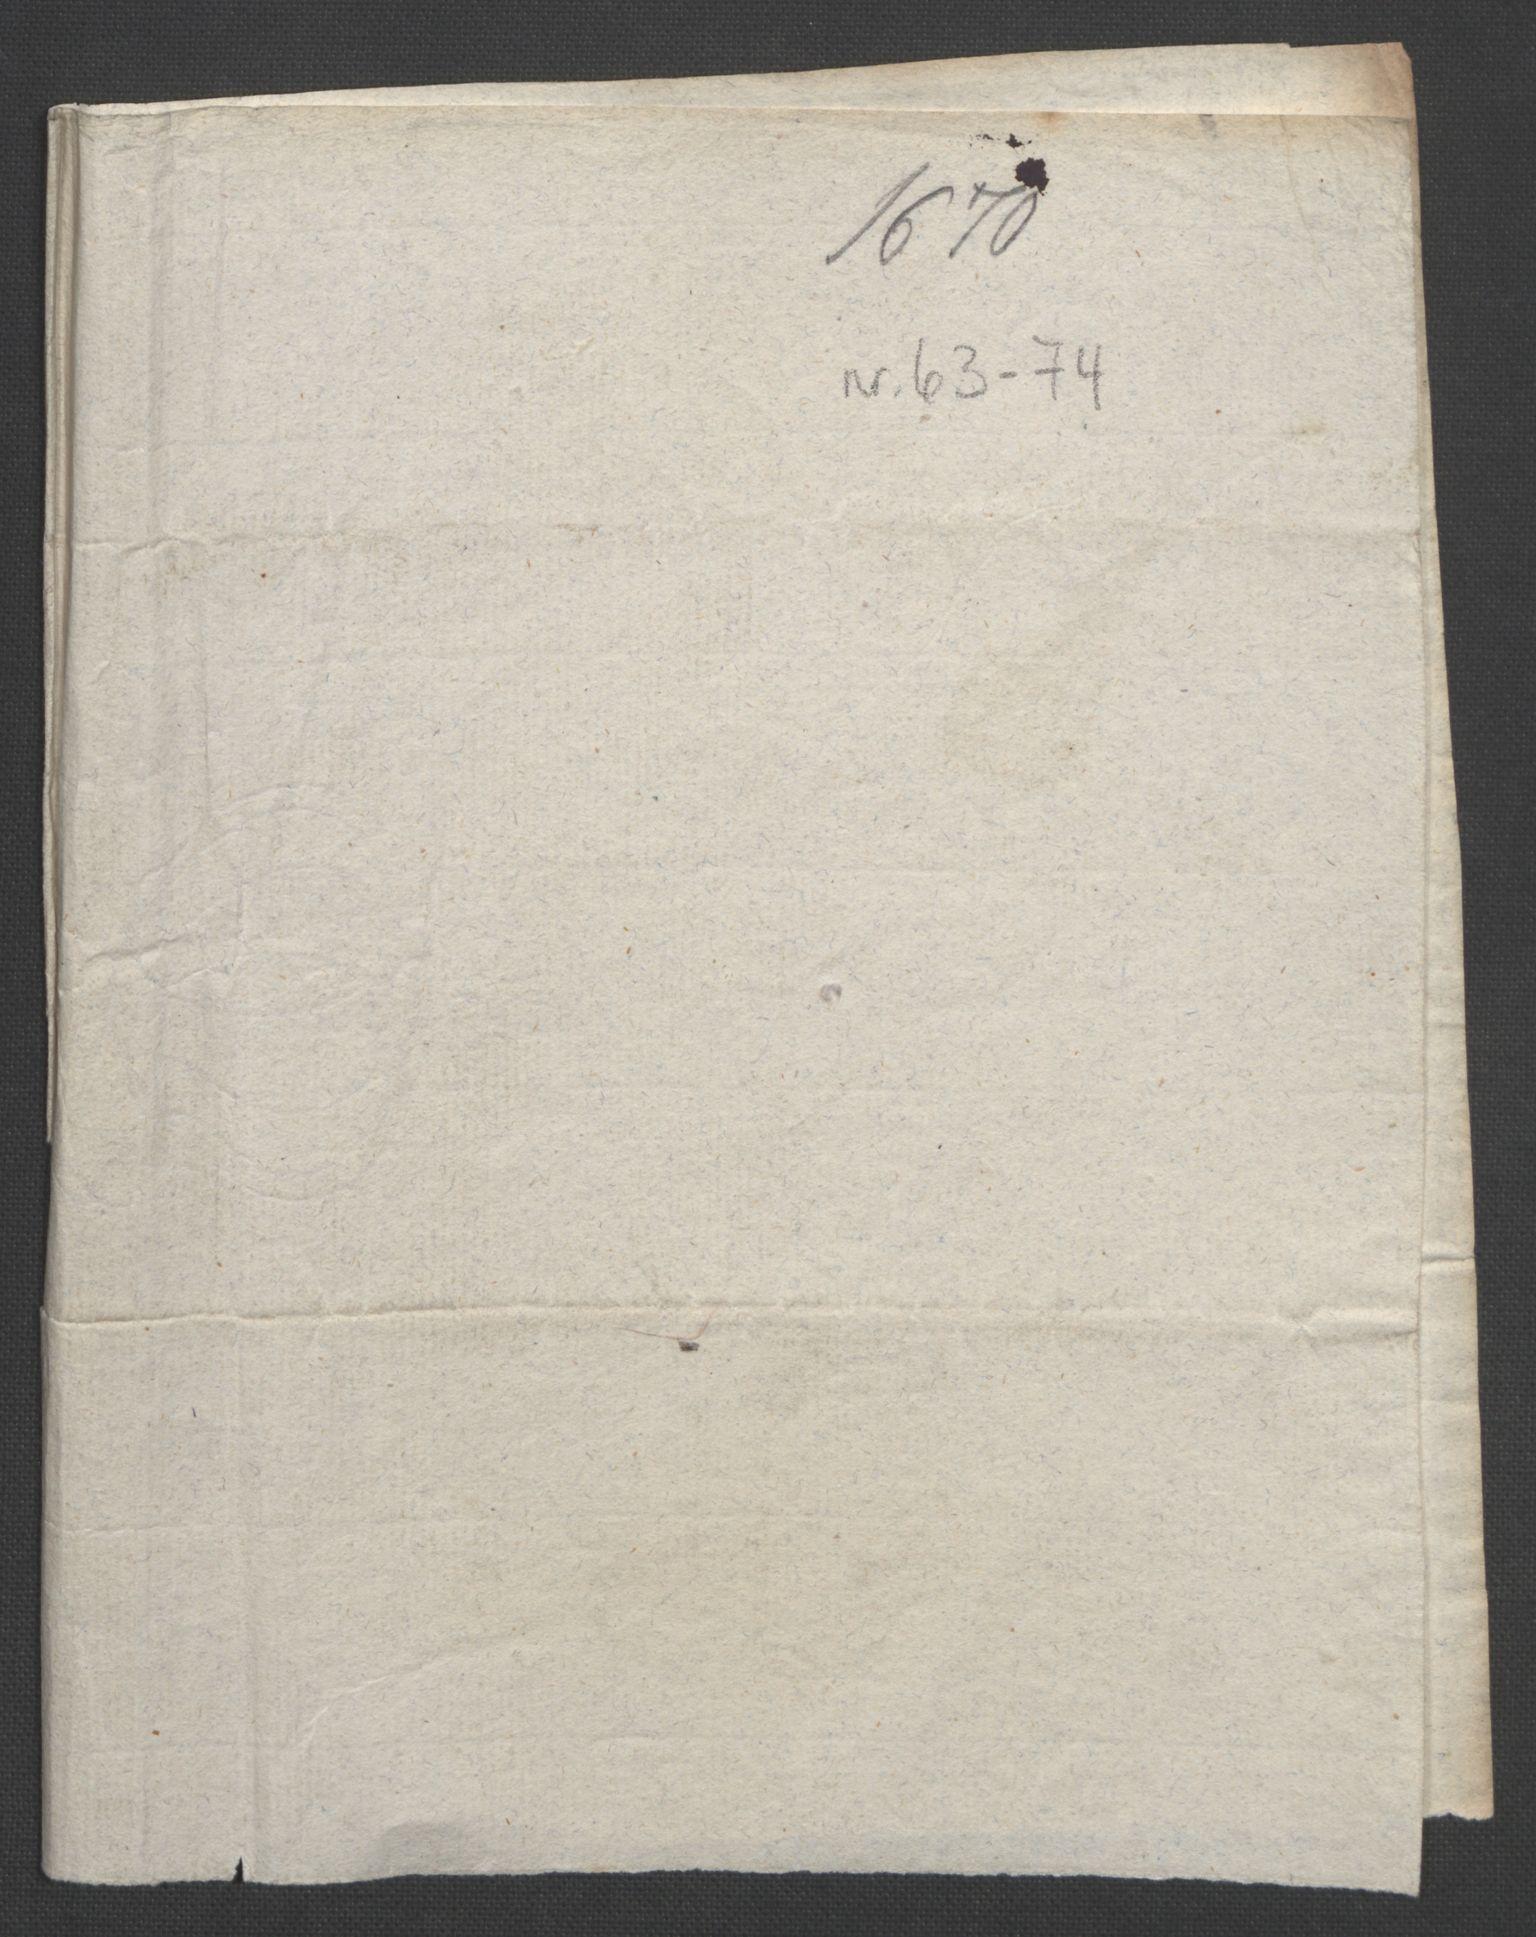 RA, Rentekammeret inntil 1814, Reviderte regnskaper, Fogderegnskap, R32/L1842: Fogderegnskap Jarlsberg grevskap, 1664-1673, s. 156